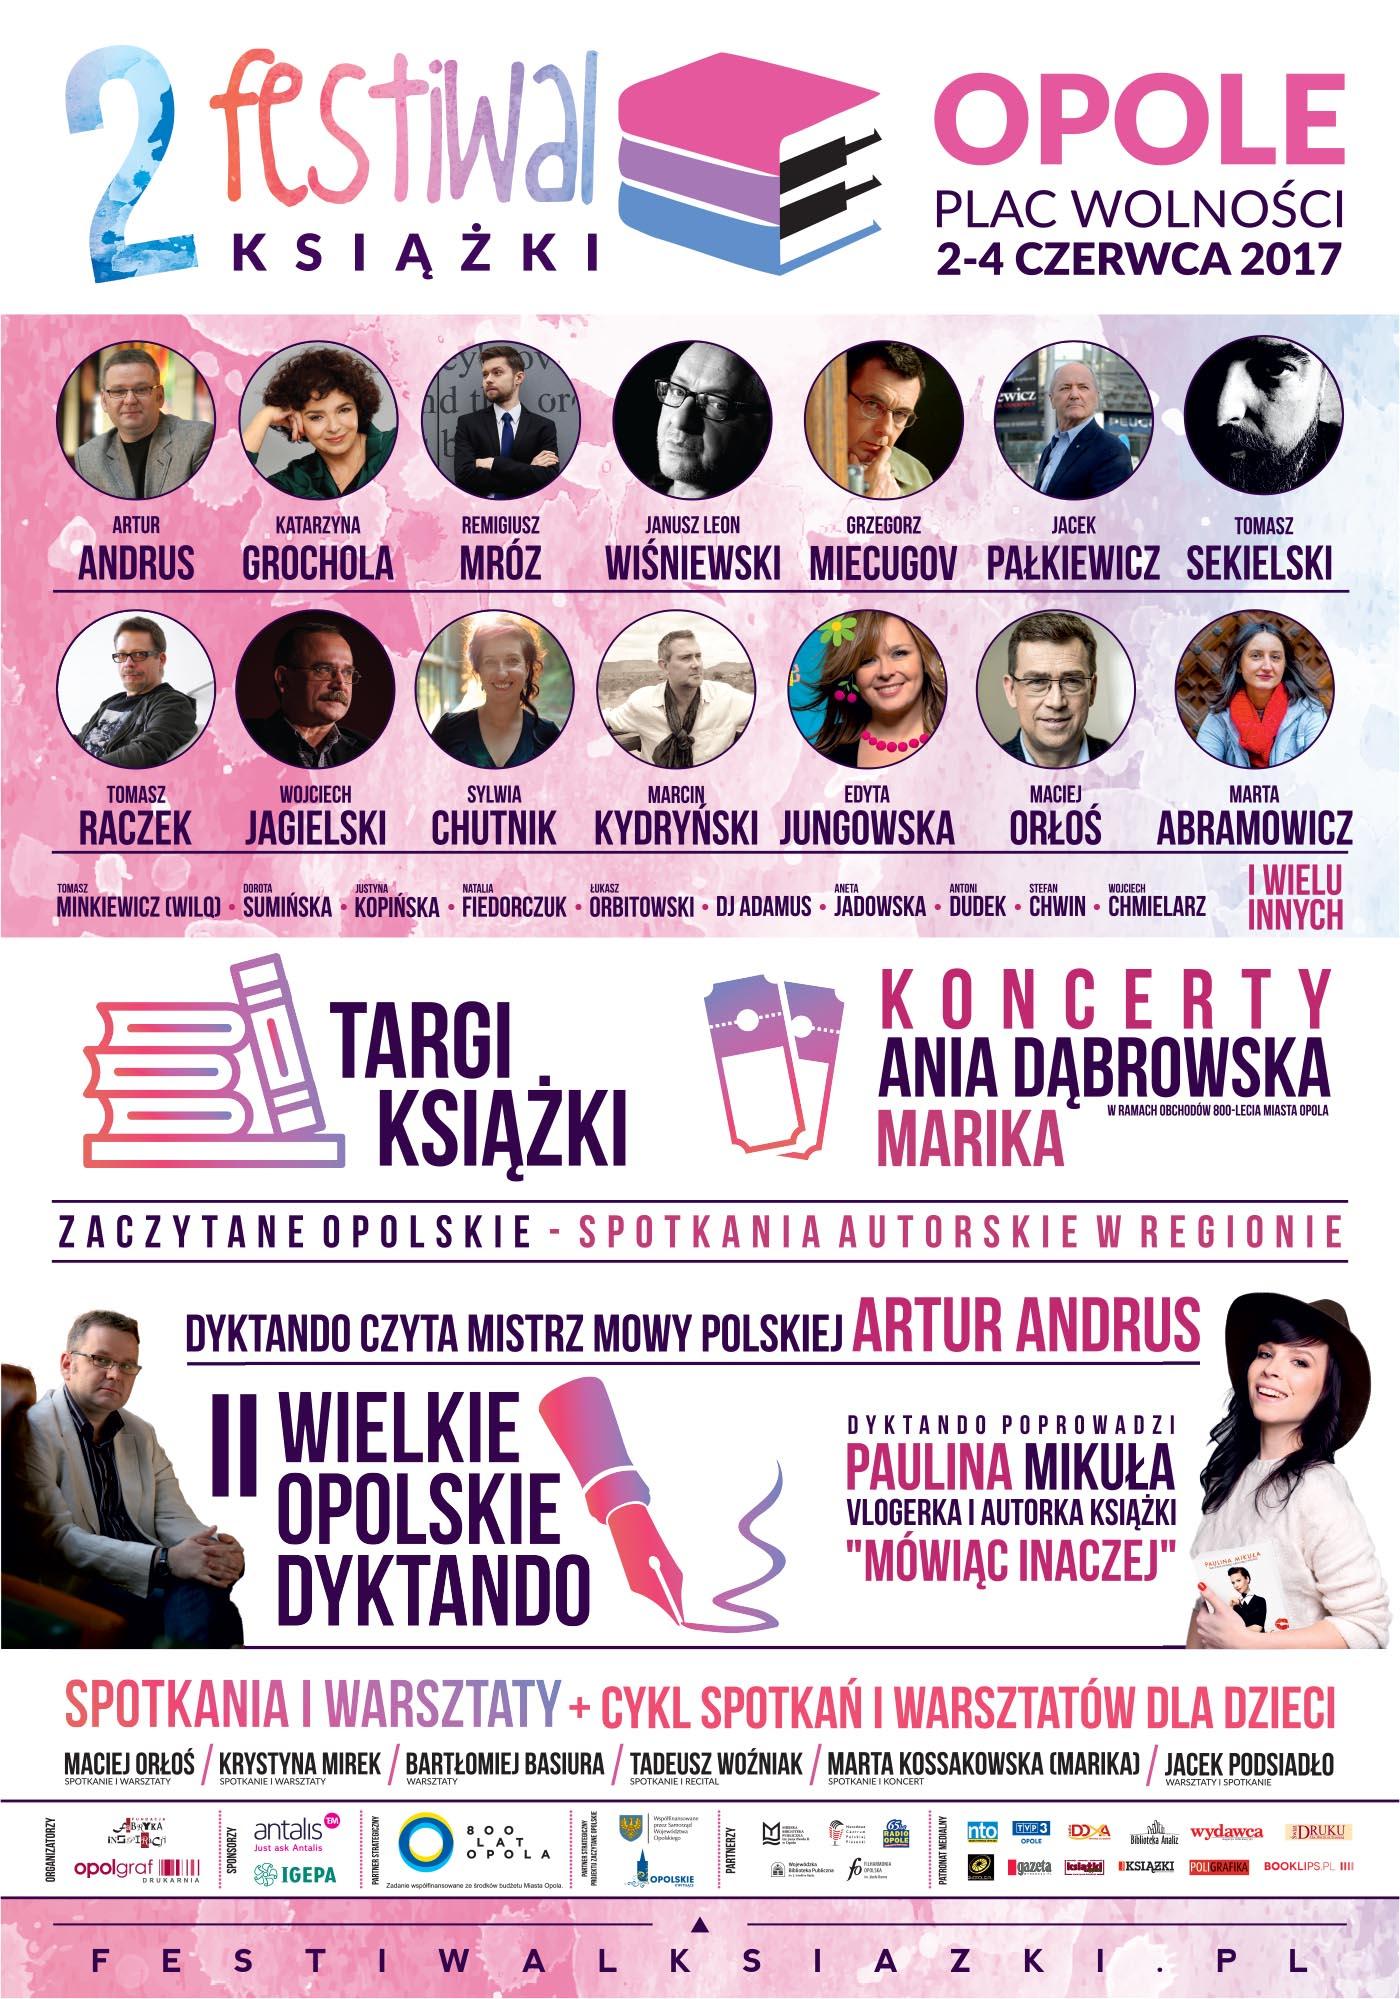 2. Festiwal Książki w MBP